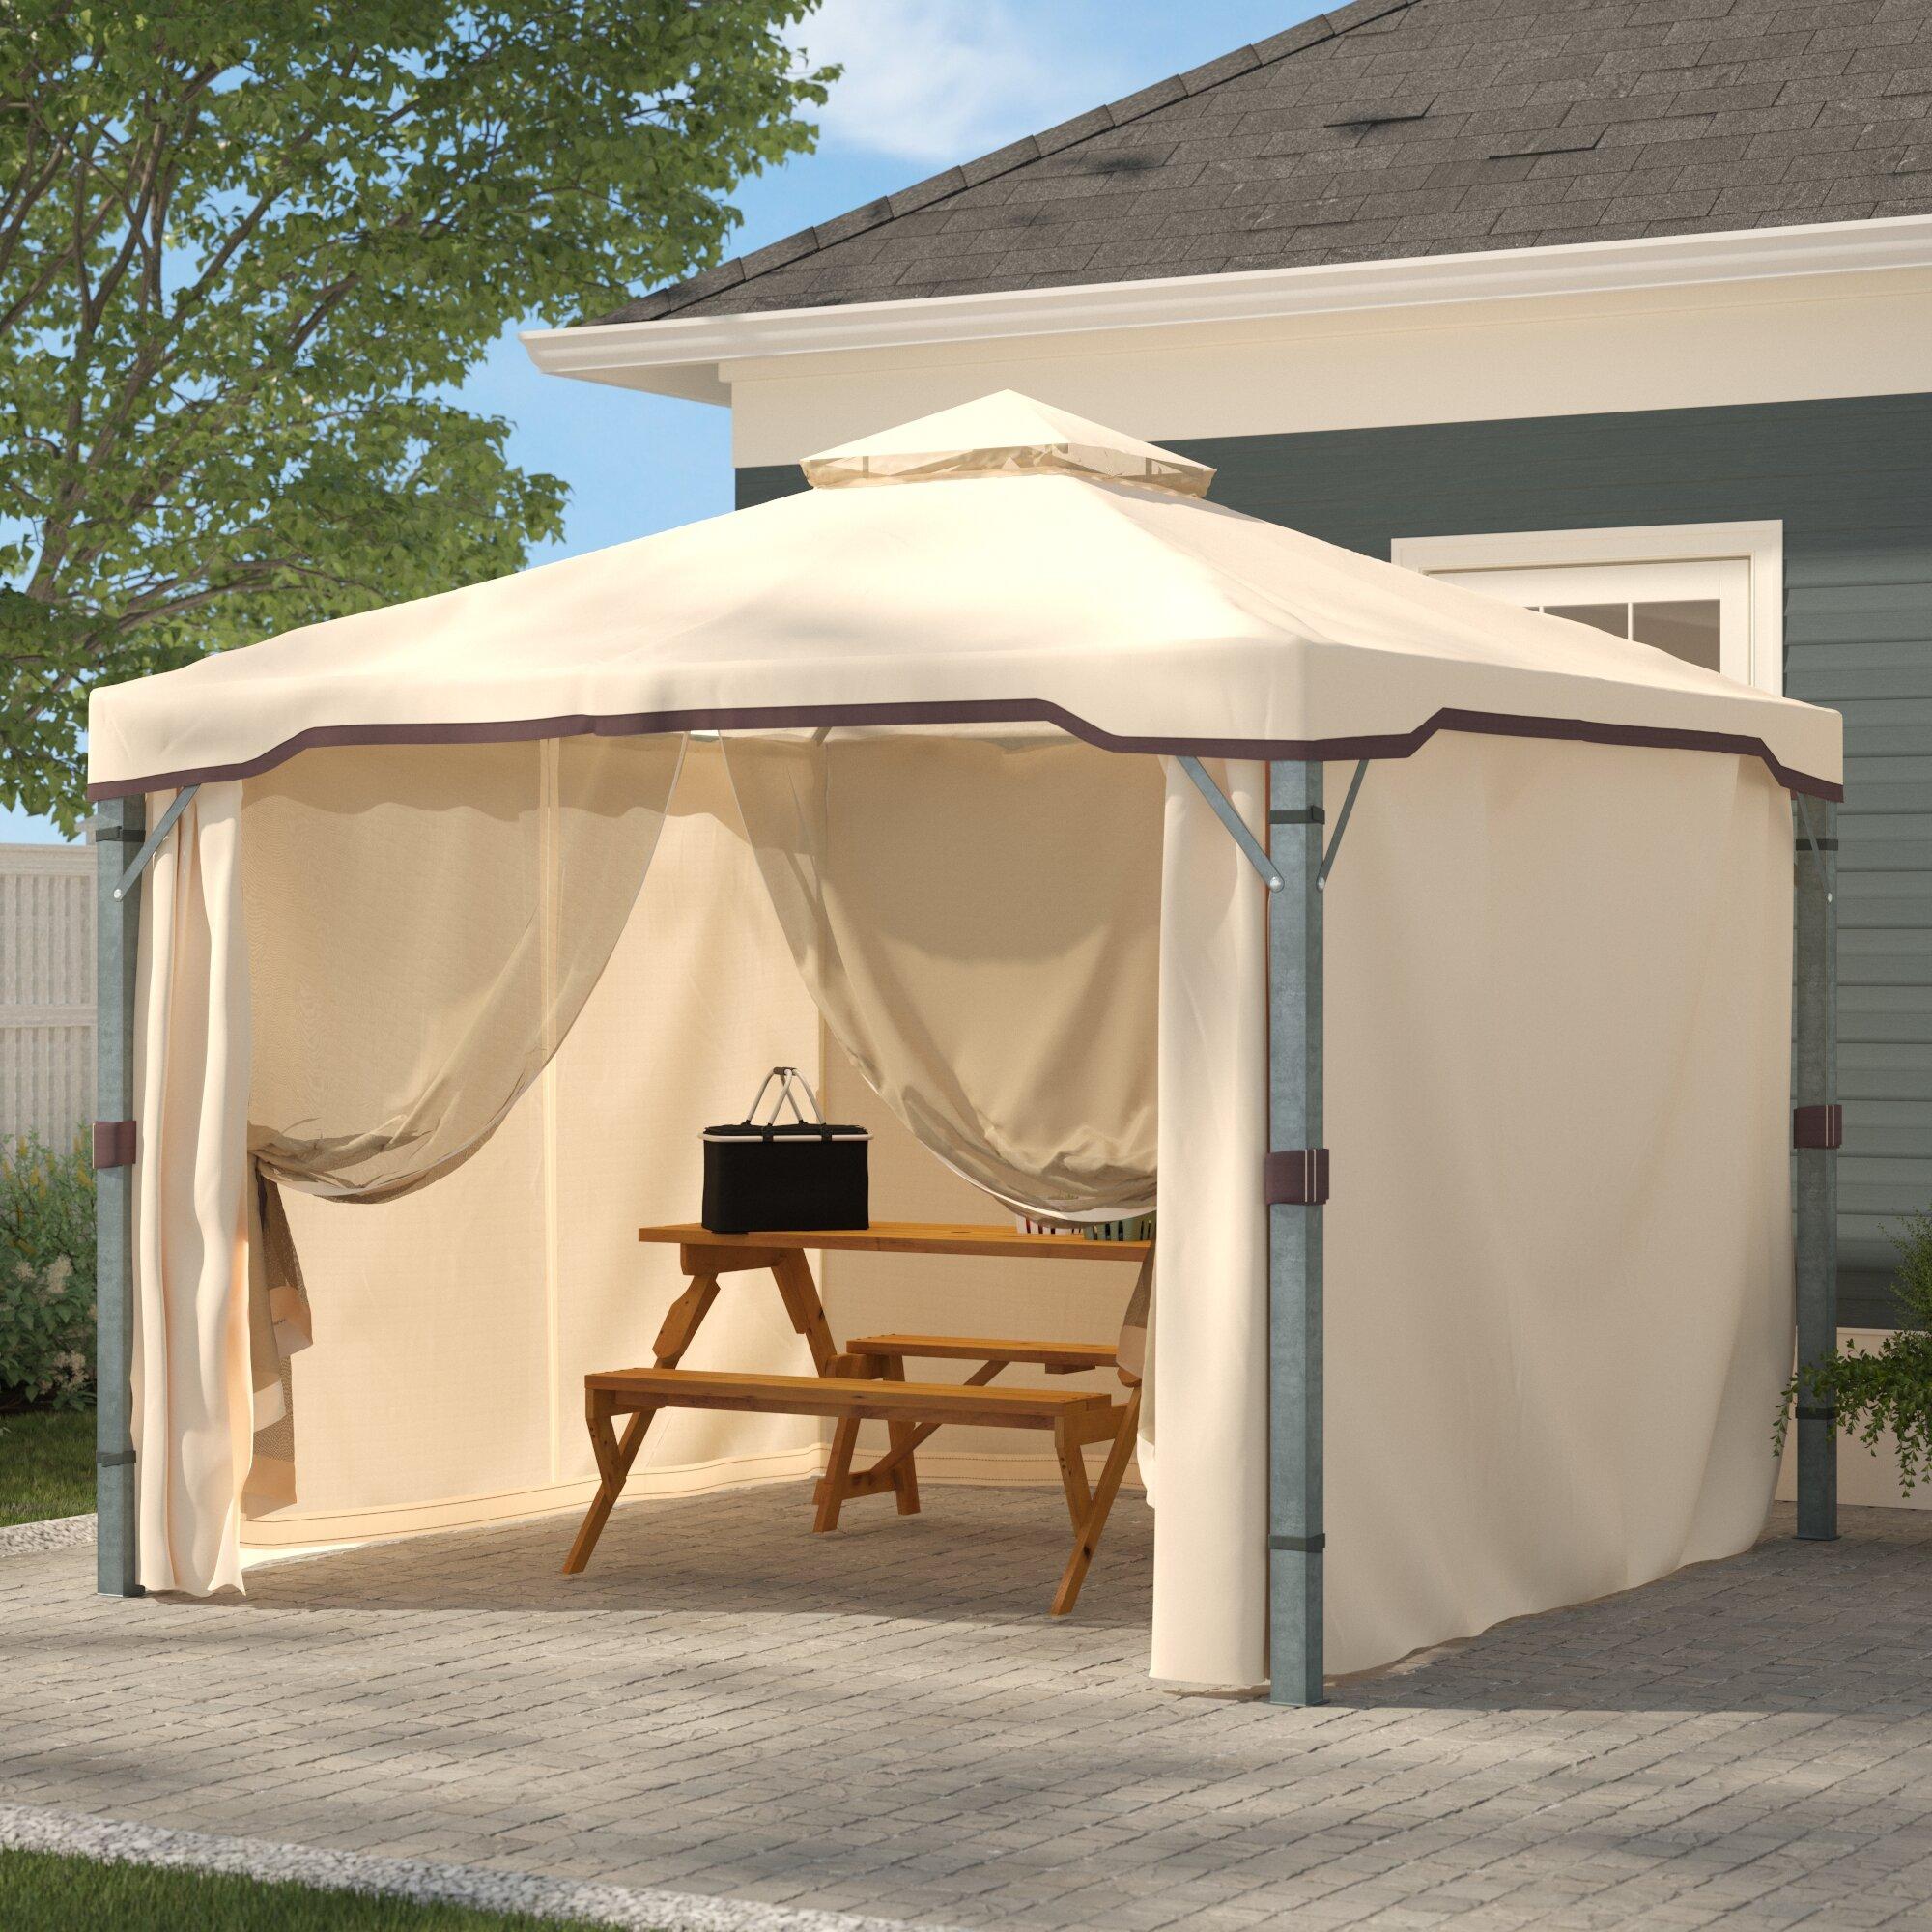 Gazebos Sold Individually Outdoor Patio 98 Length Mosquito Netting Curtain Panel Garden Patio Omnitel Com Na